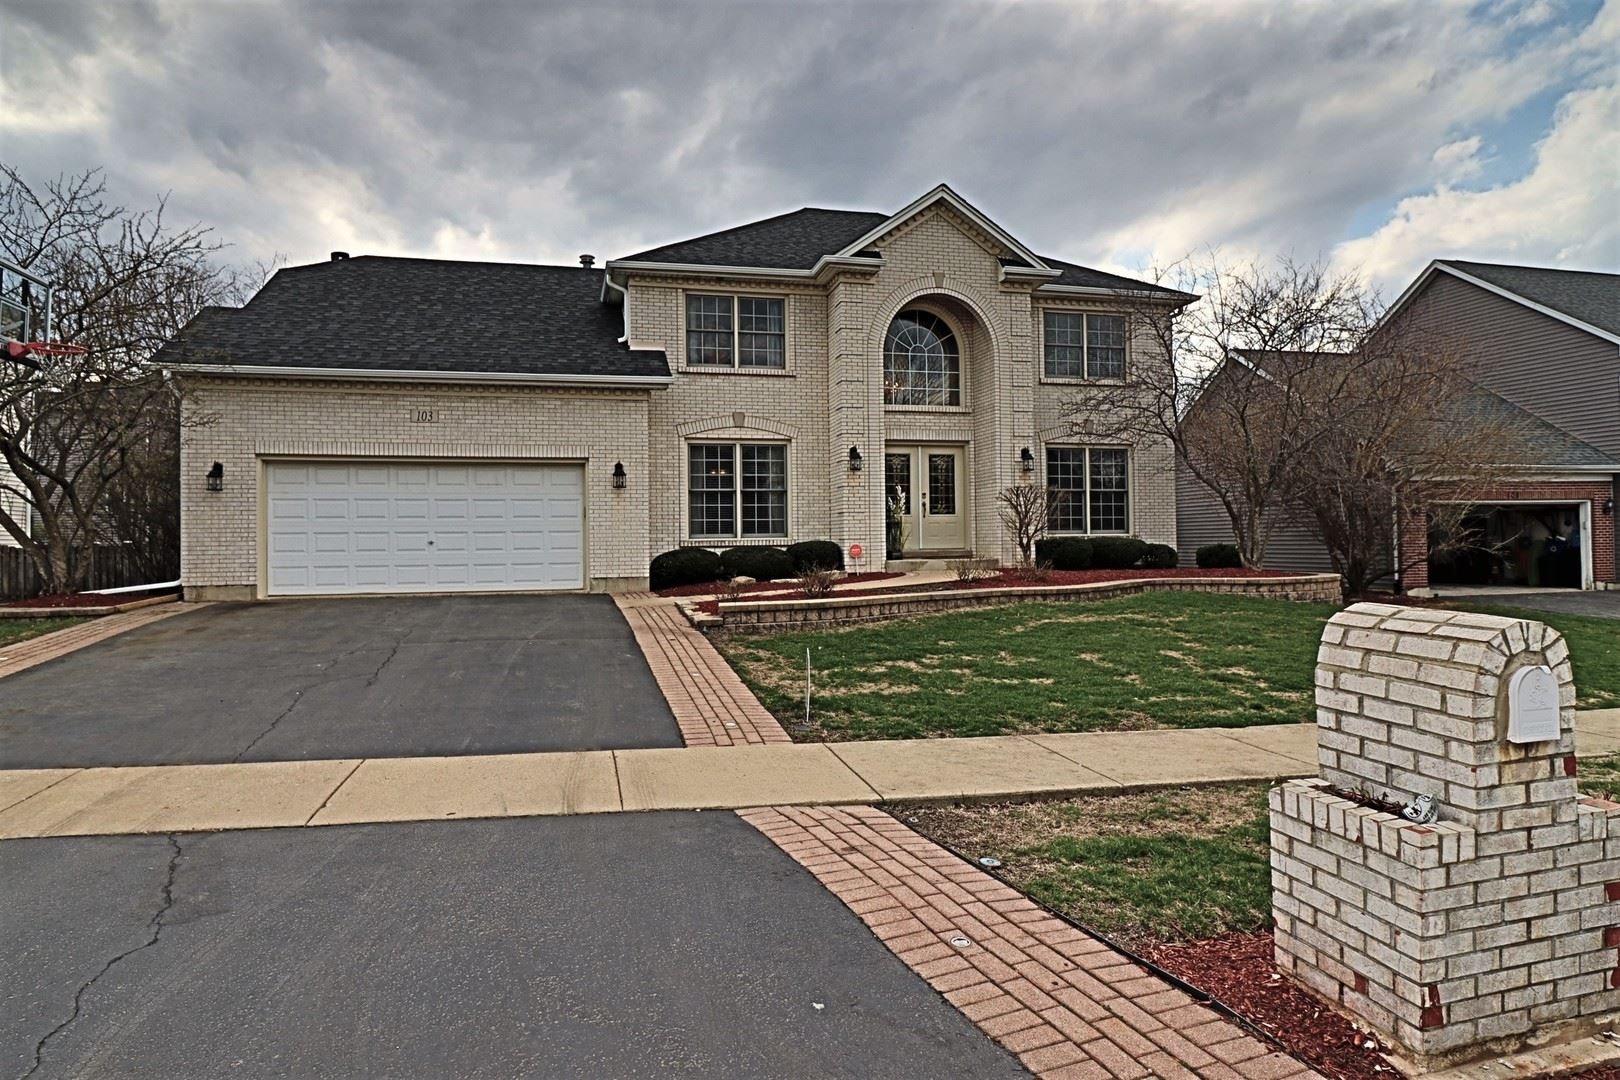 Photo of 103 Ivy Lane, Bolingbrook, IL 60490 (MLS # 11027082)